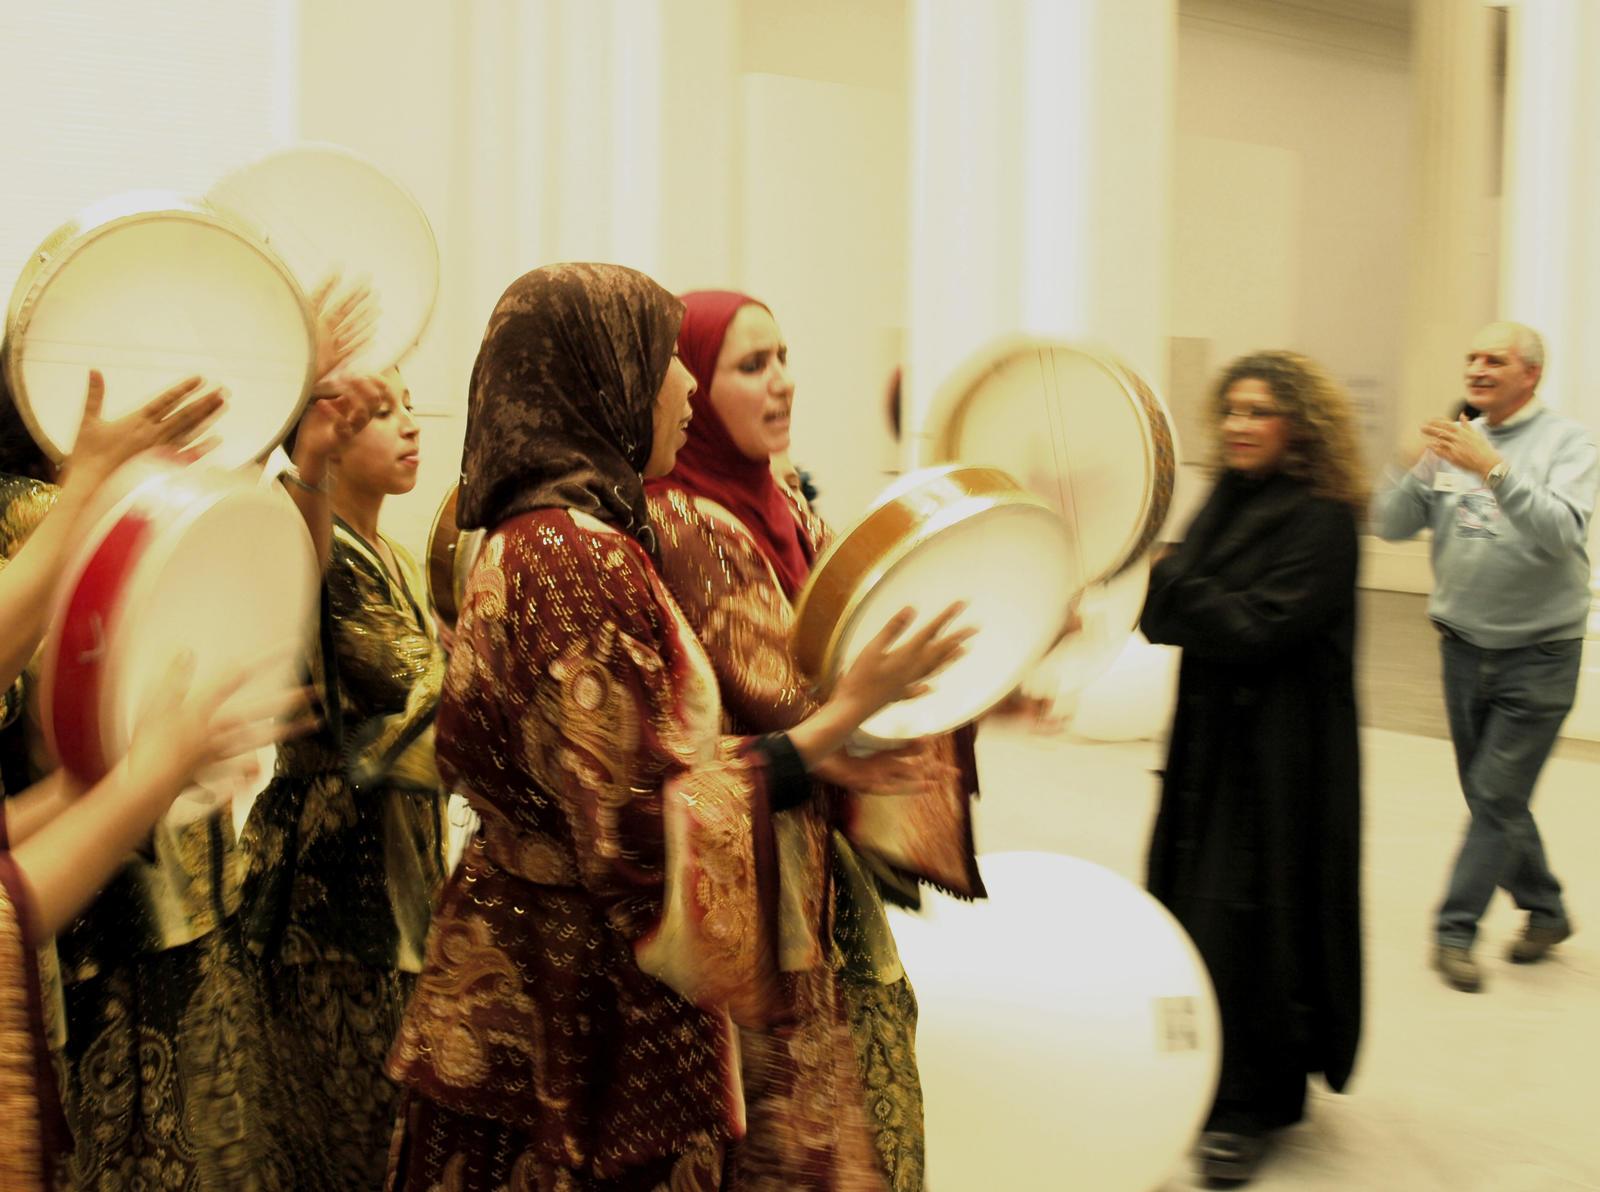 Les femmes d'Oujda (Maroc). Liège, 2007.